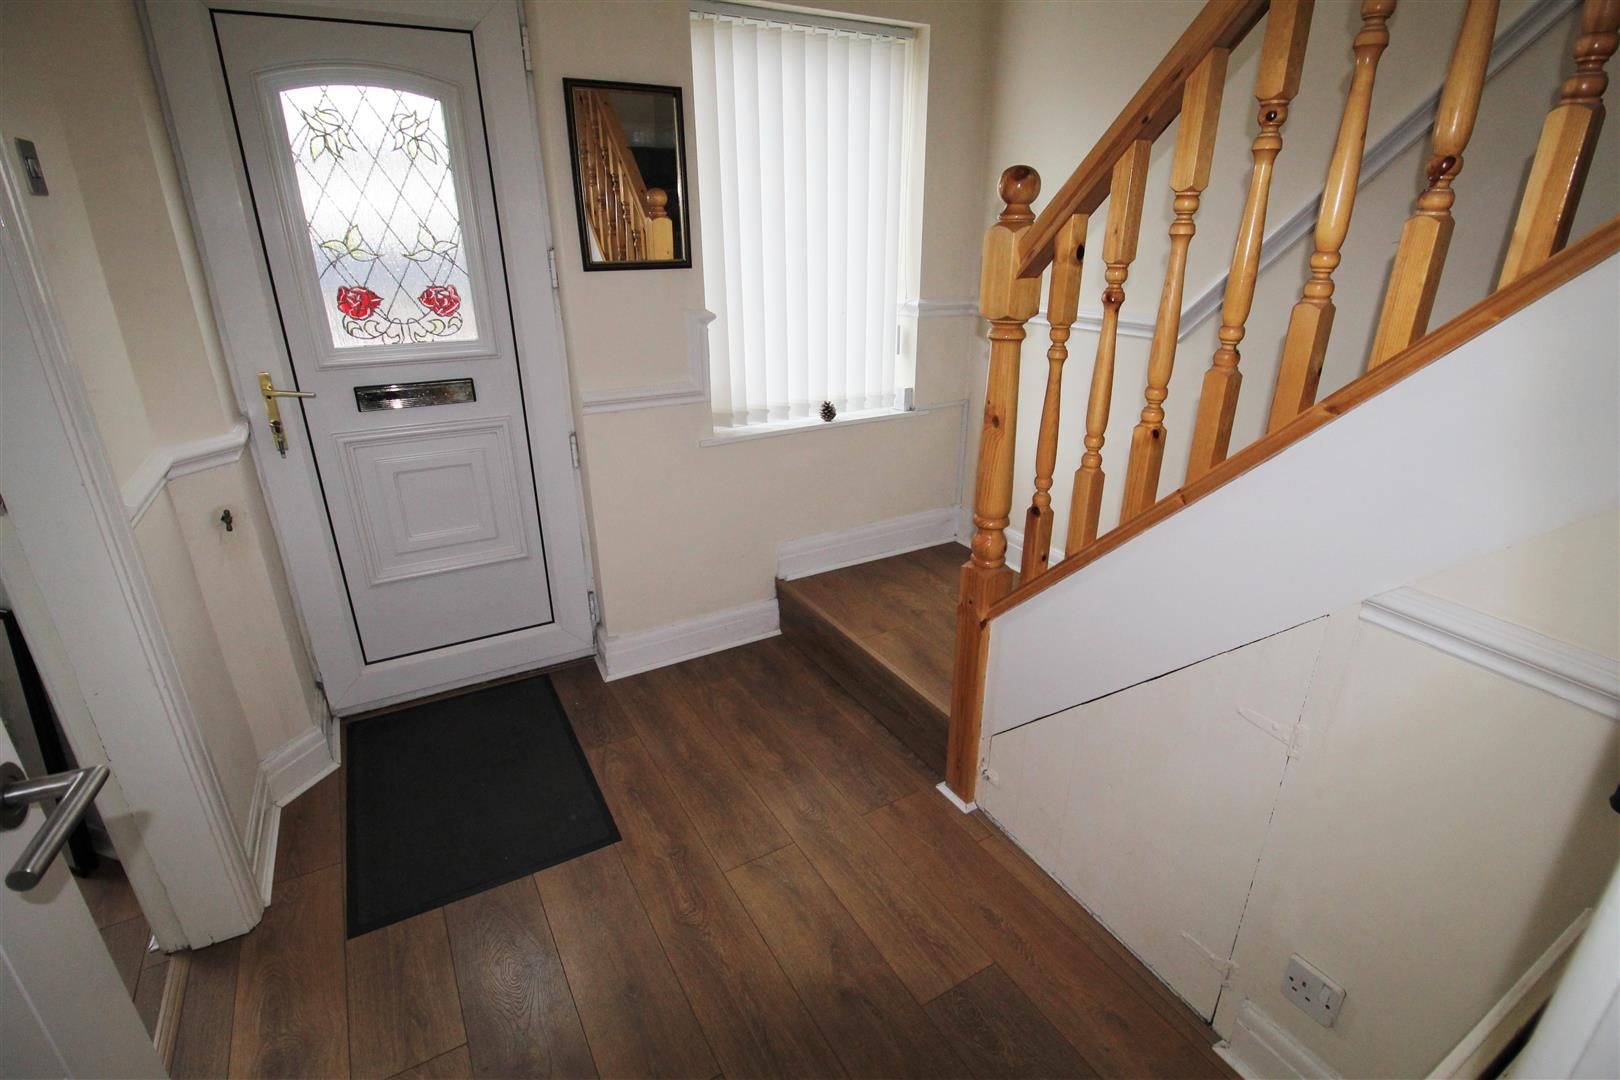 3 Bedrooms, House - Semi-Detached, Woodley Road, Liverpool